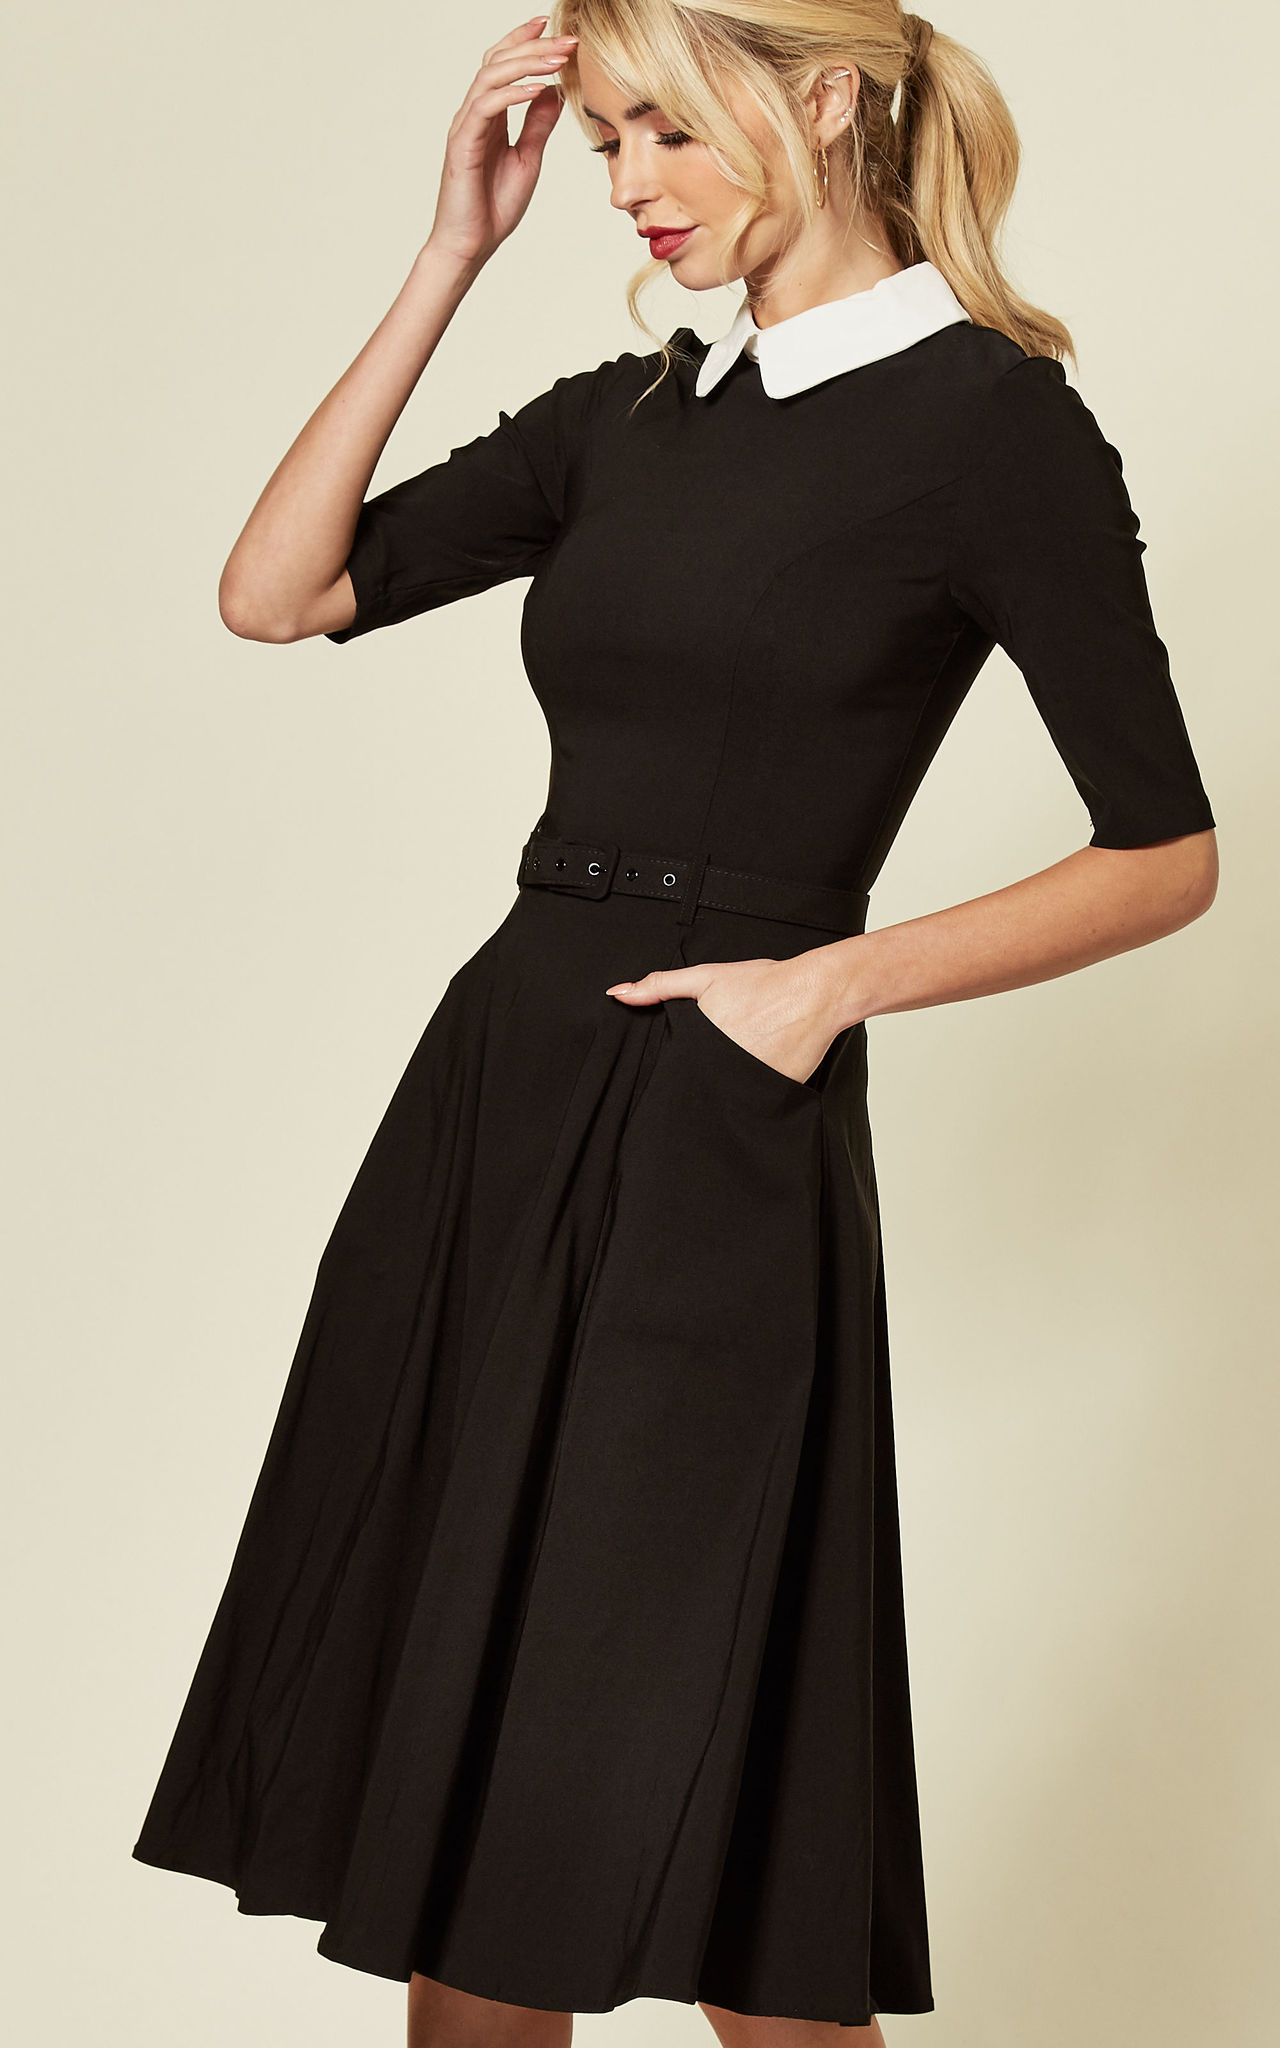 Heather Blue Stripe Embellished Maxi Dress | ANGELEYE | SilkFred